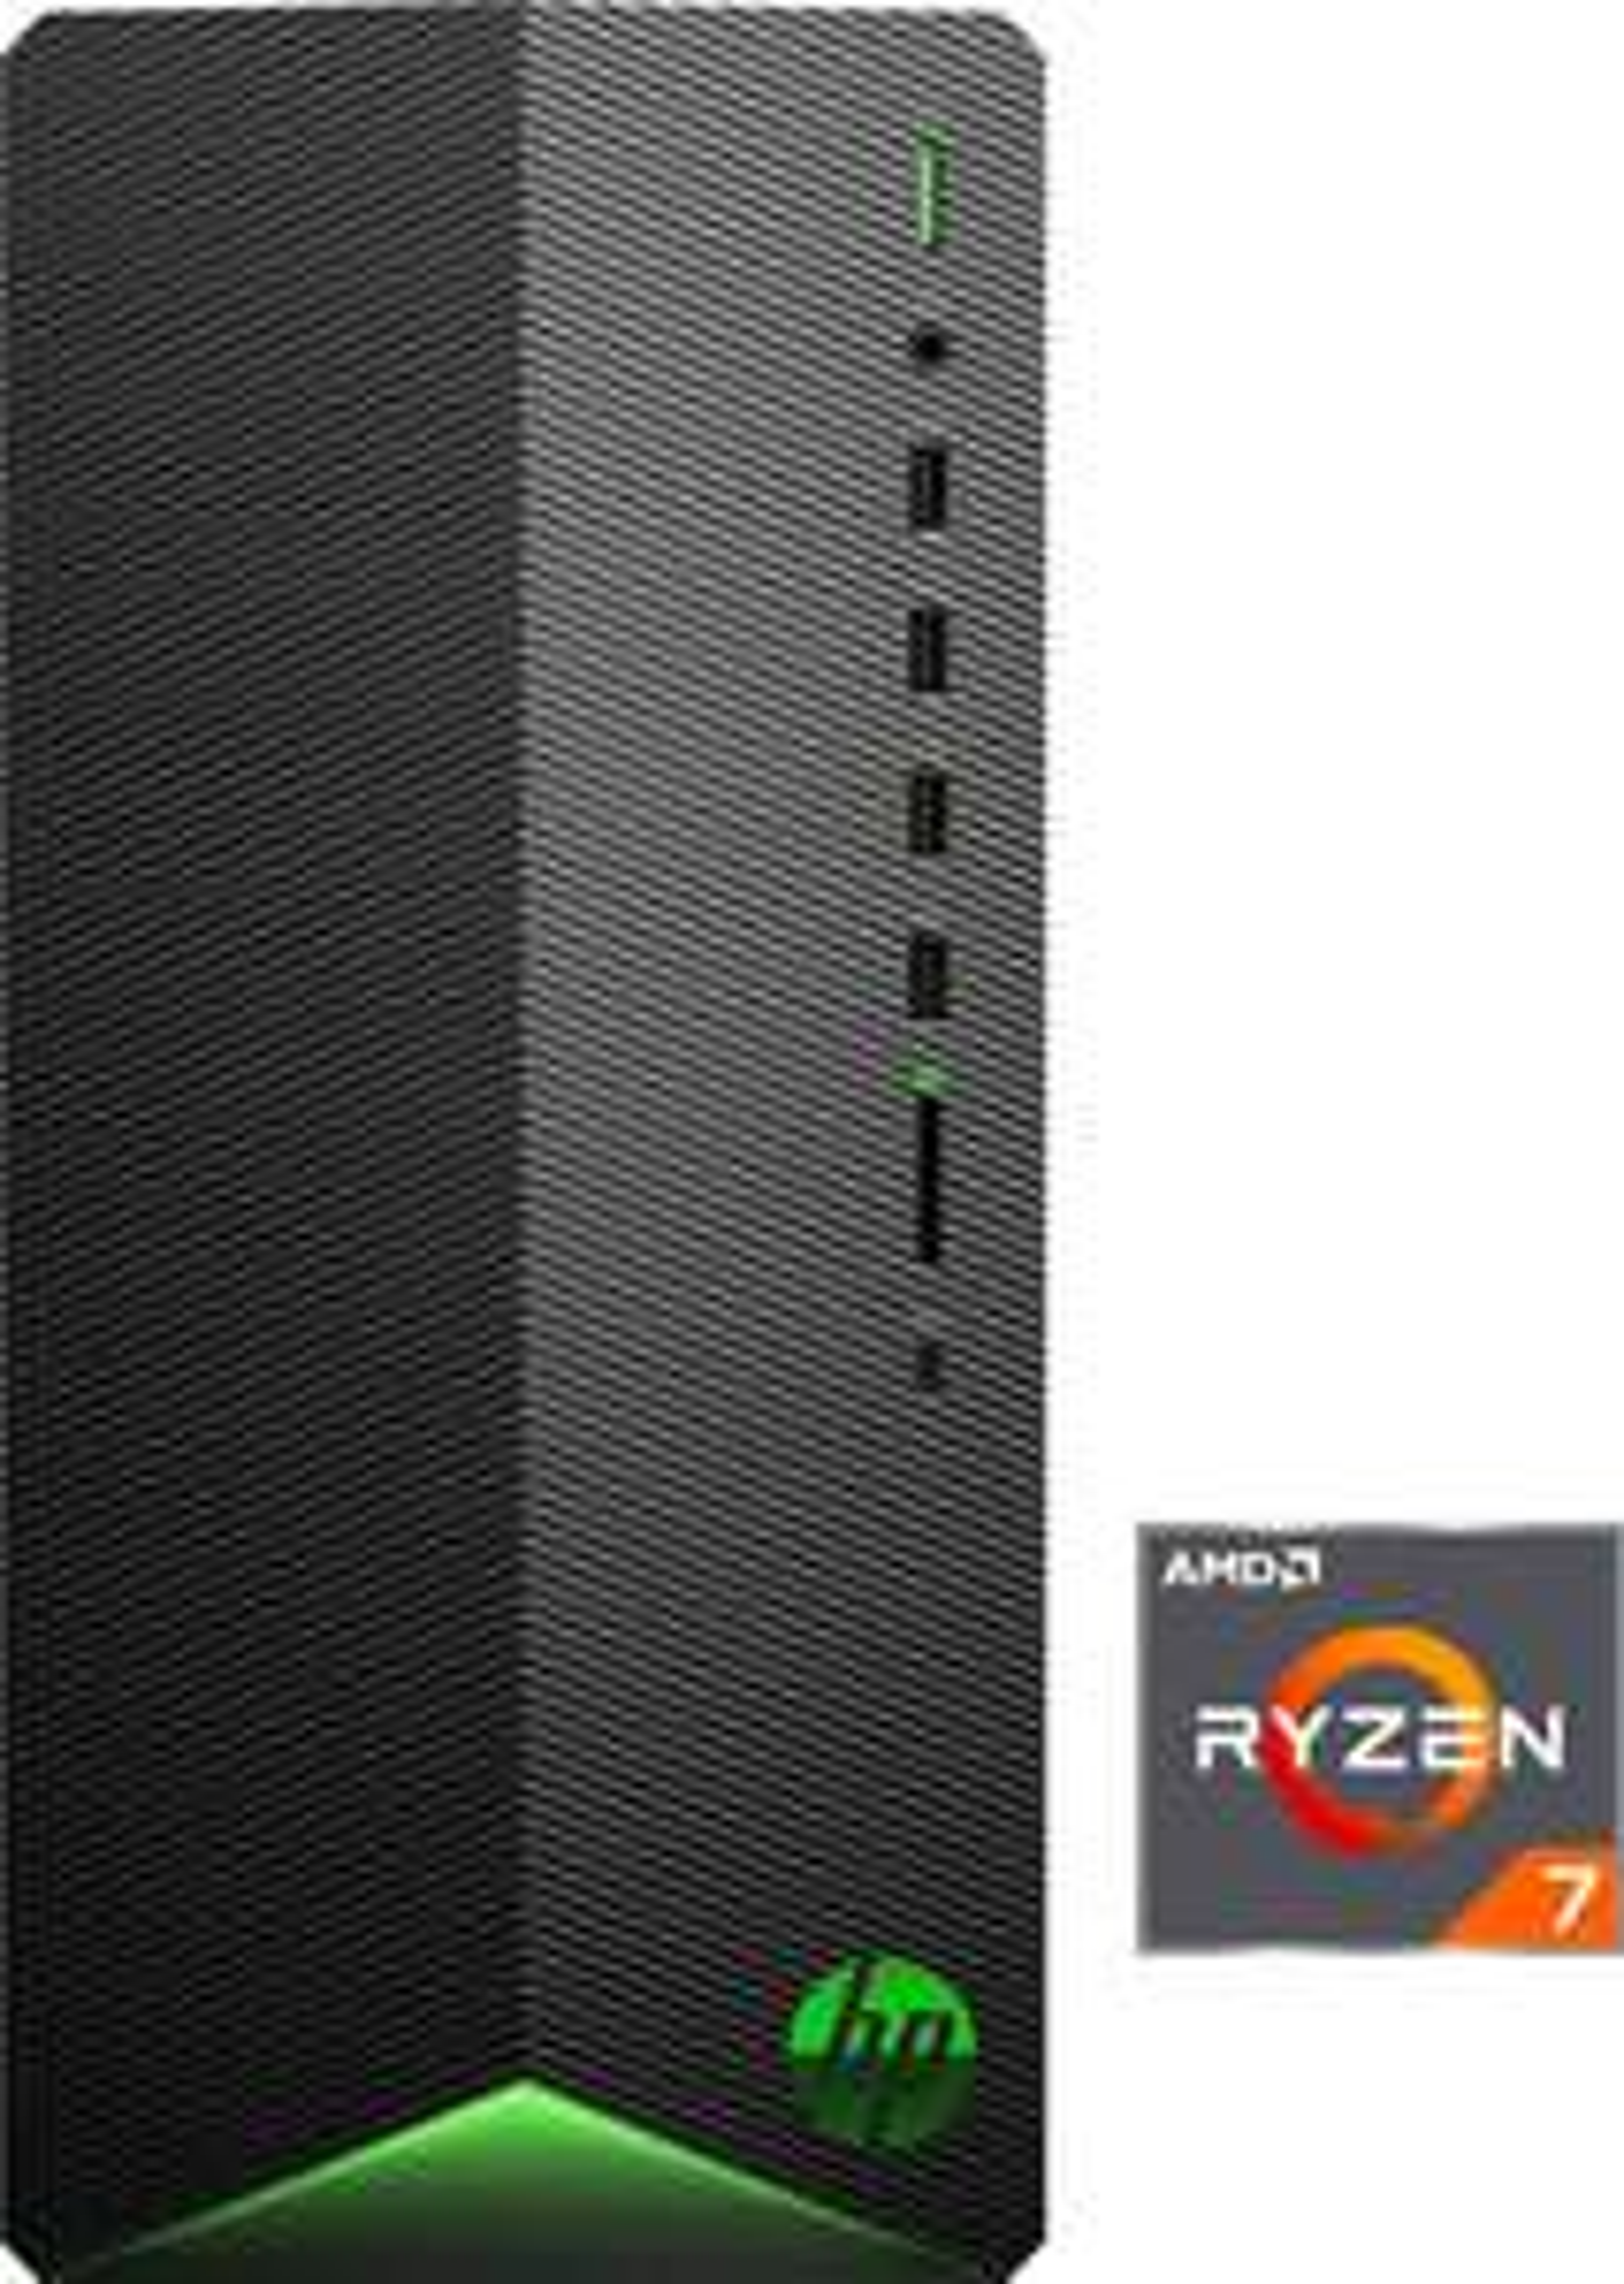 HP Pavilion Gaming Ryzen 7 4700G, 16GB, 512GB SSD, RTX 3060 Ti